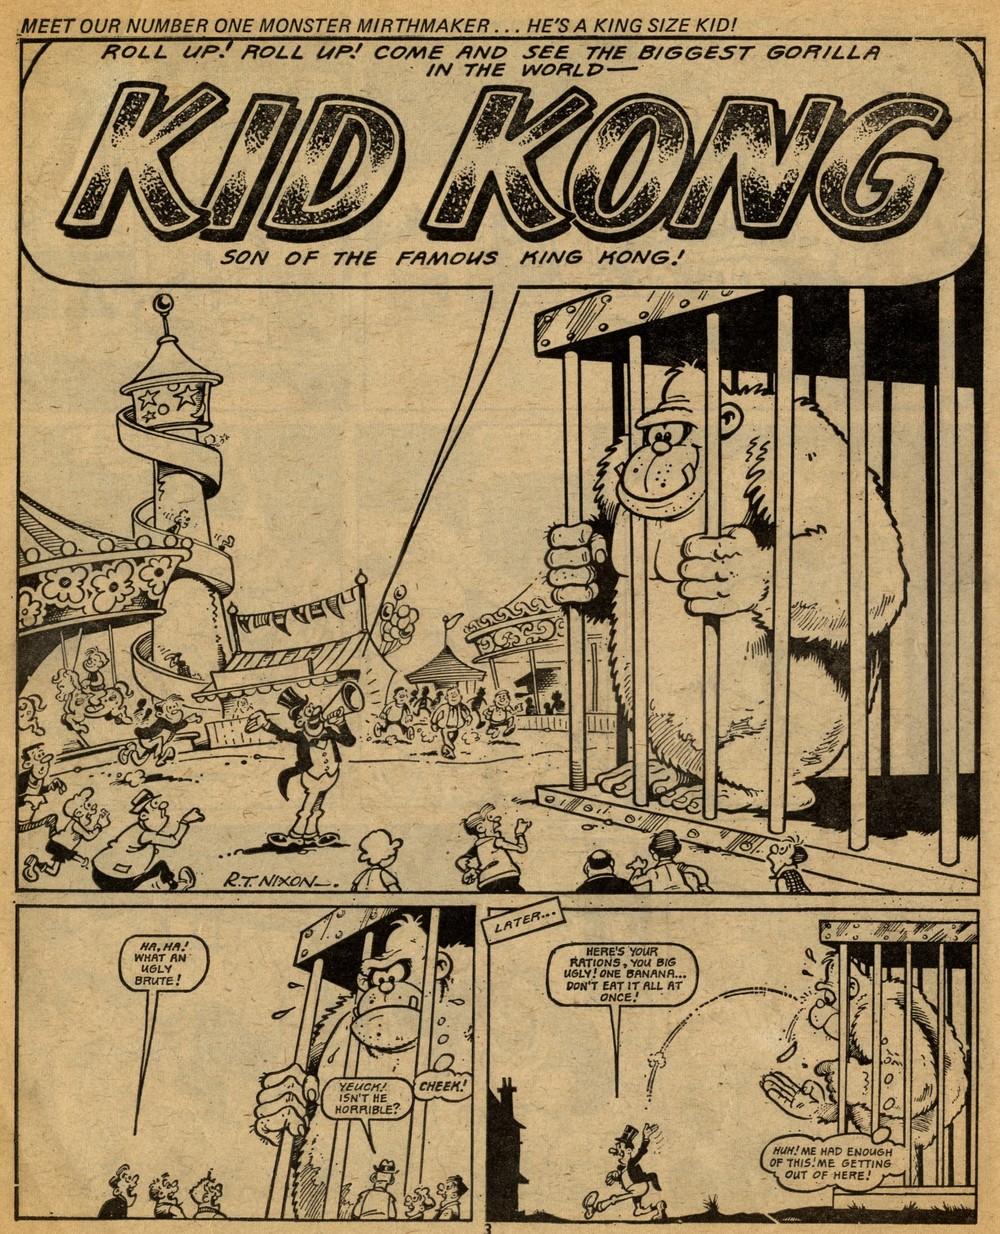 Kid Kong: Robert Nixon (artist)